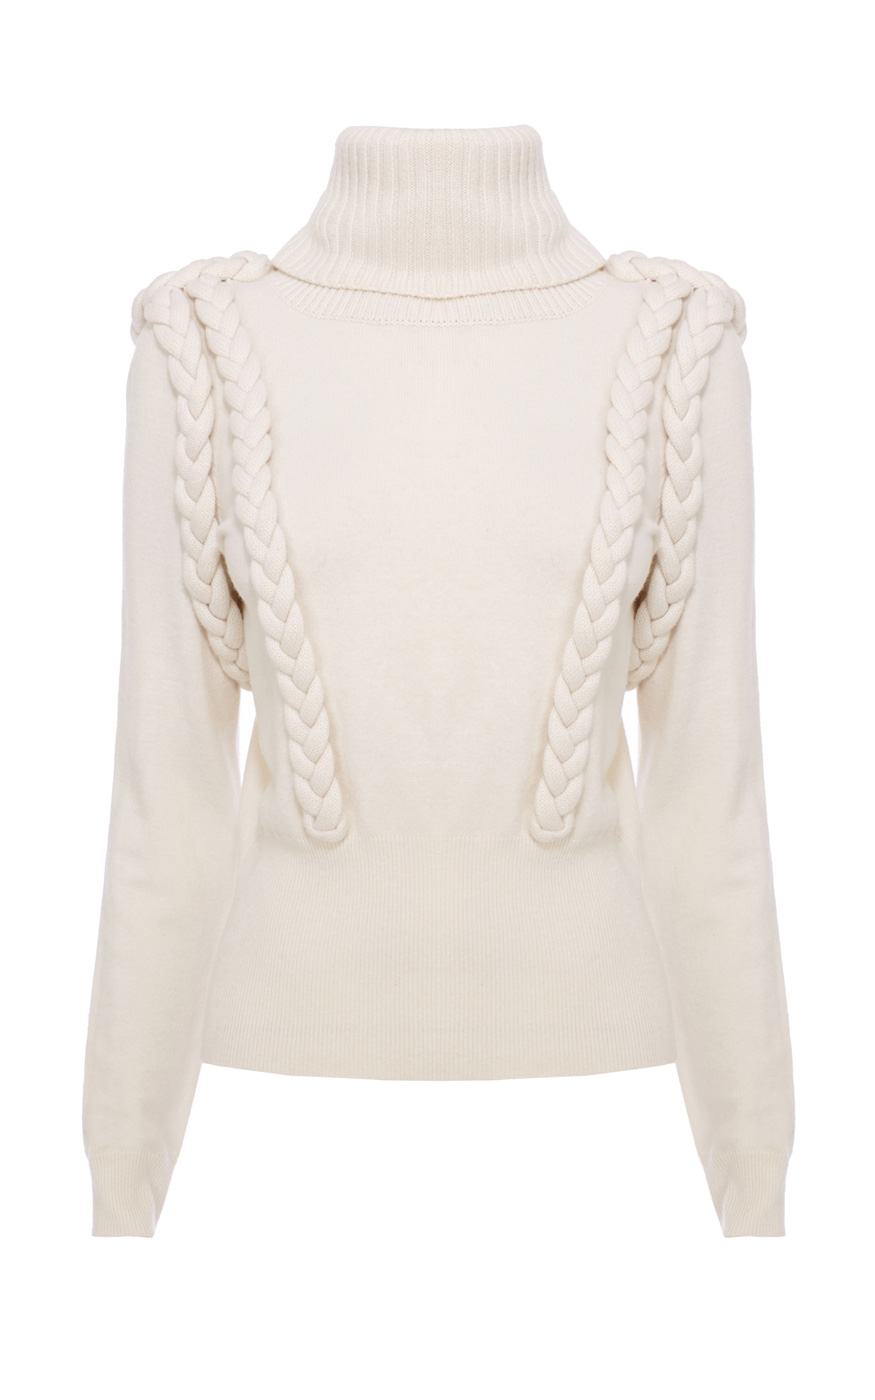 e29304cc8e6 PLAITED CABLE COWL NECK JUMPER | Luxury Women's knitwear | Karen Millen